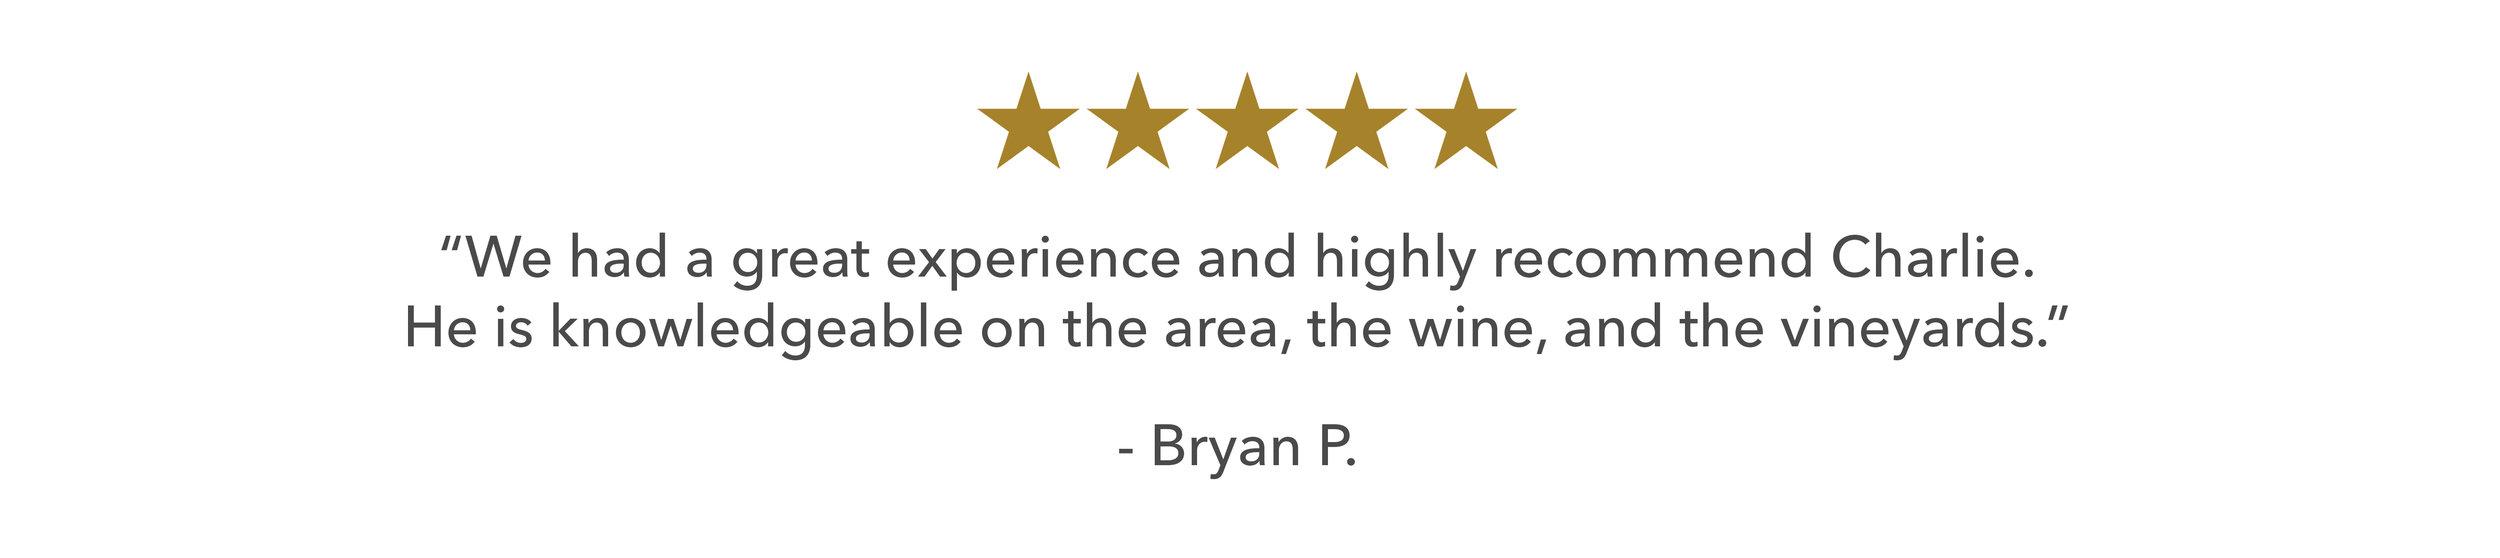 Oregon Wine Guide Reviews_4.jpg